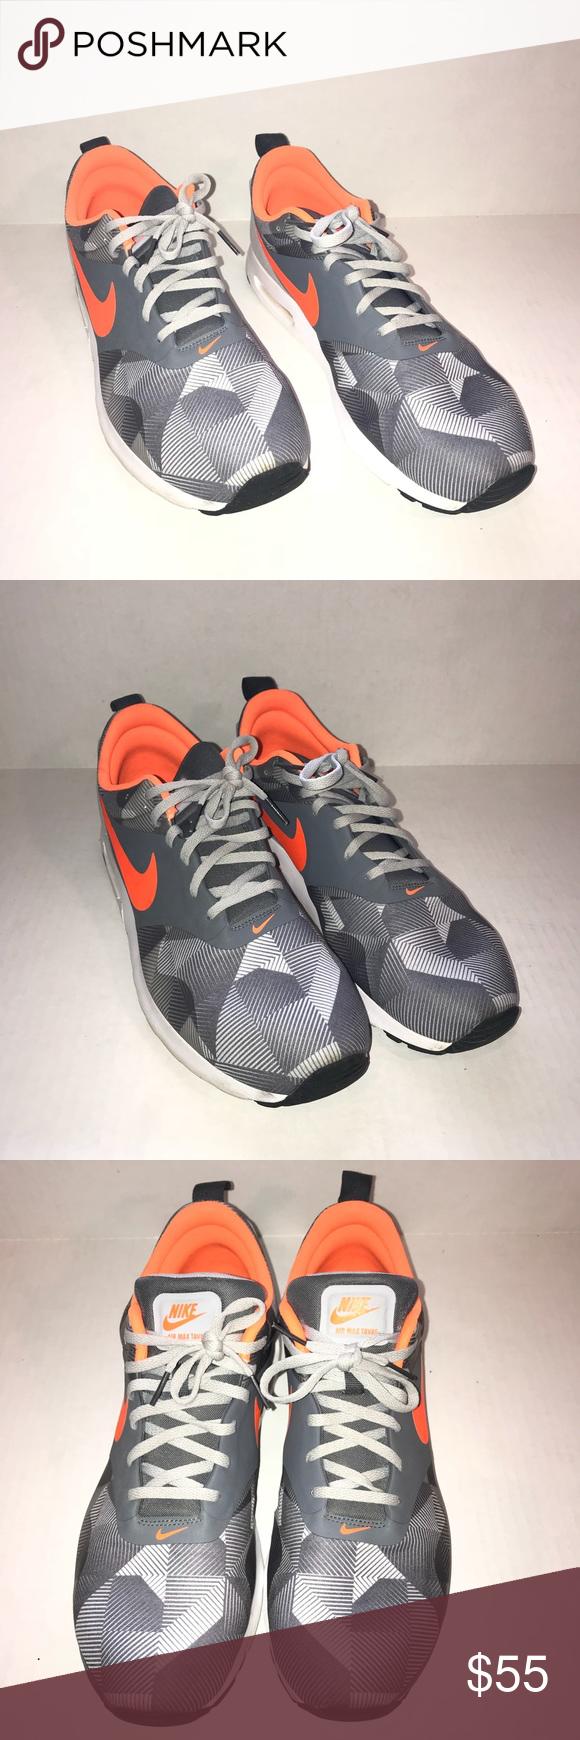 Nike Air Max Tavas, Gray \u0026 Orange, sz